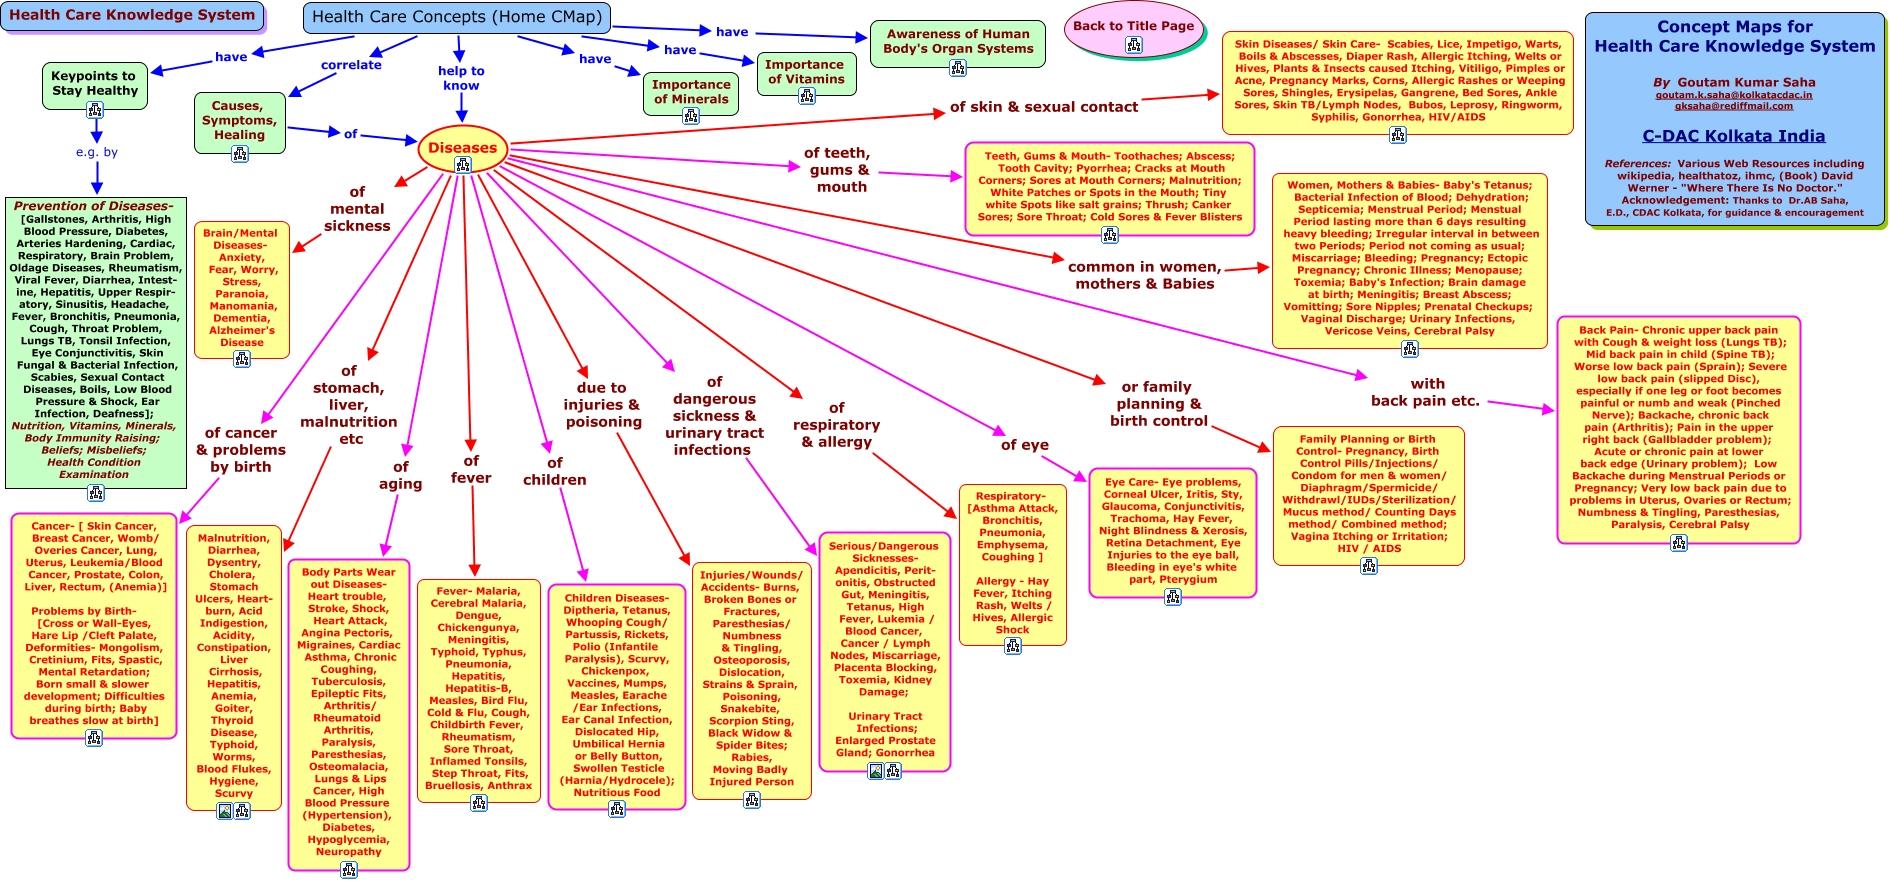 Health Care Concepts